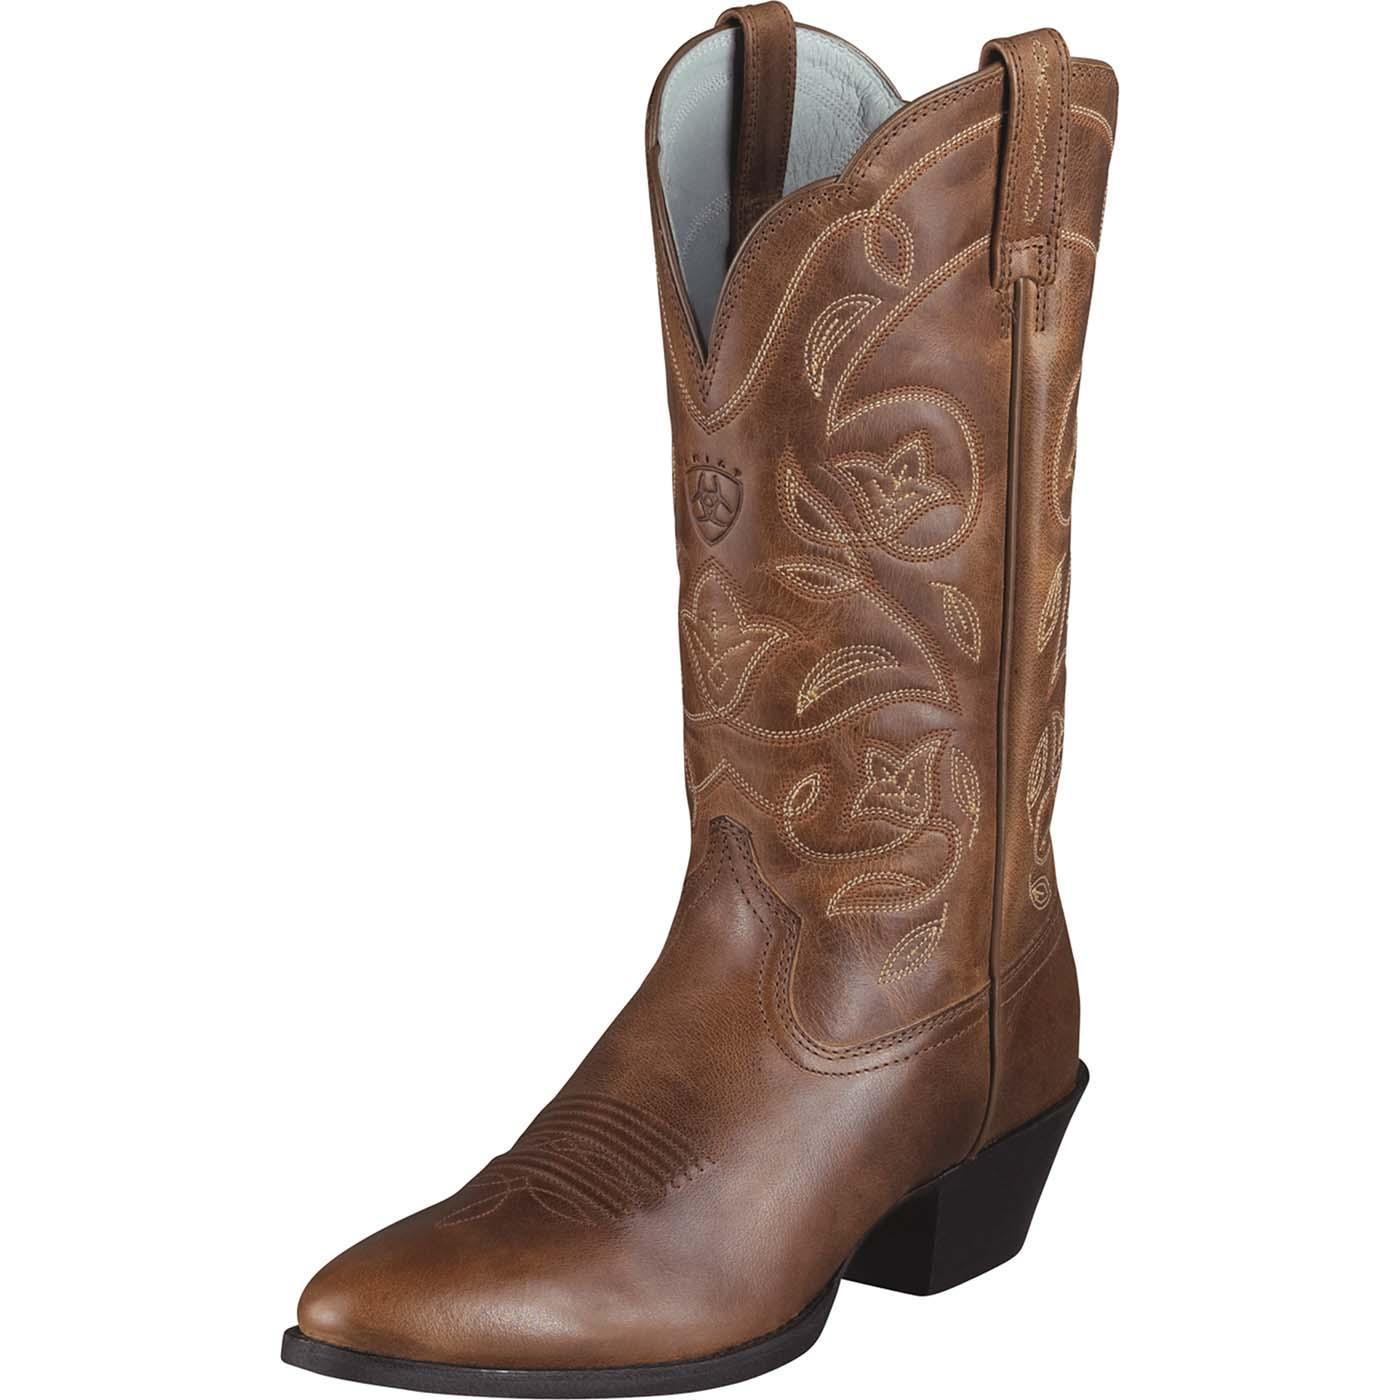 000c81ff732f Ariat Heritage Women s R Toe Western BootAriat Heritage Women s R Toe  Western Boot